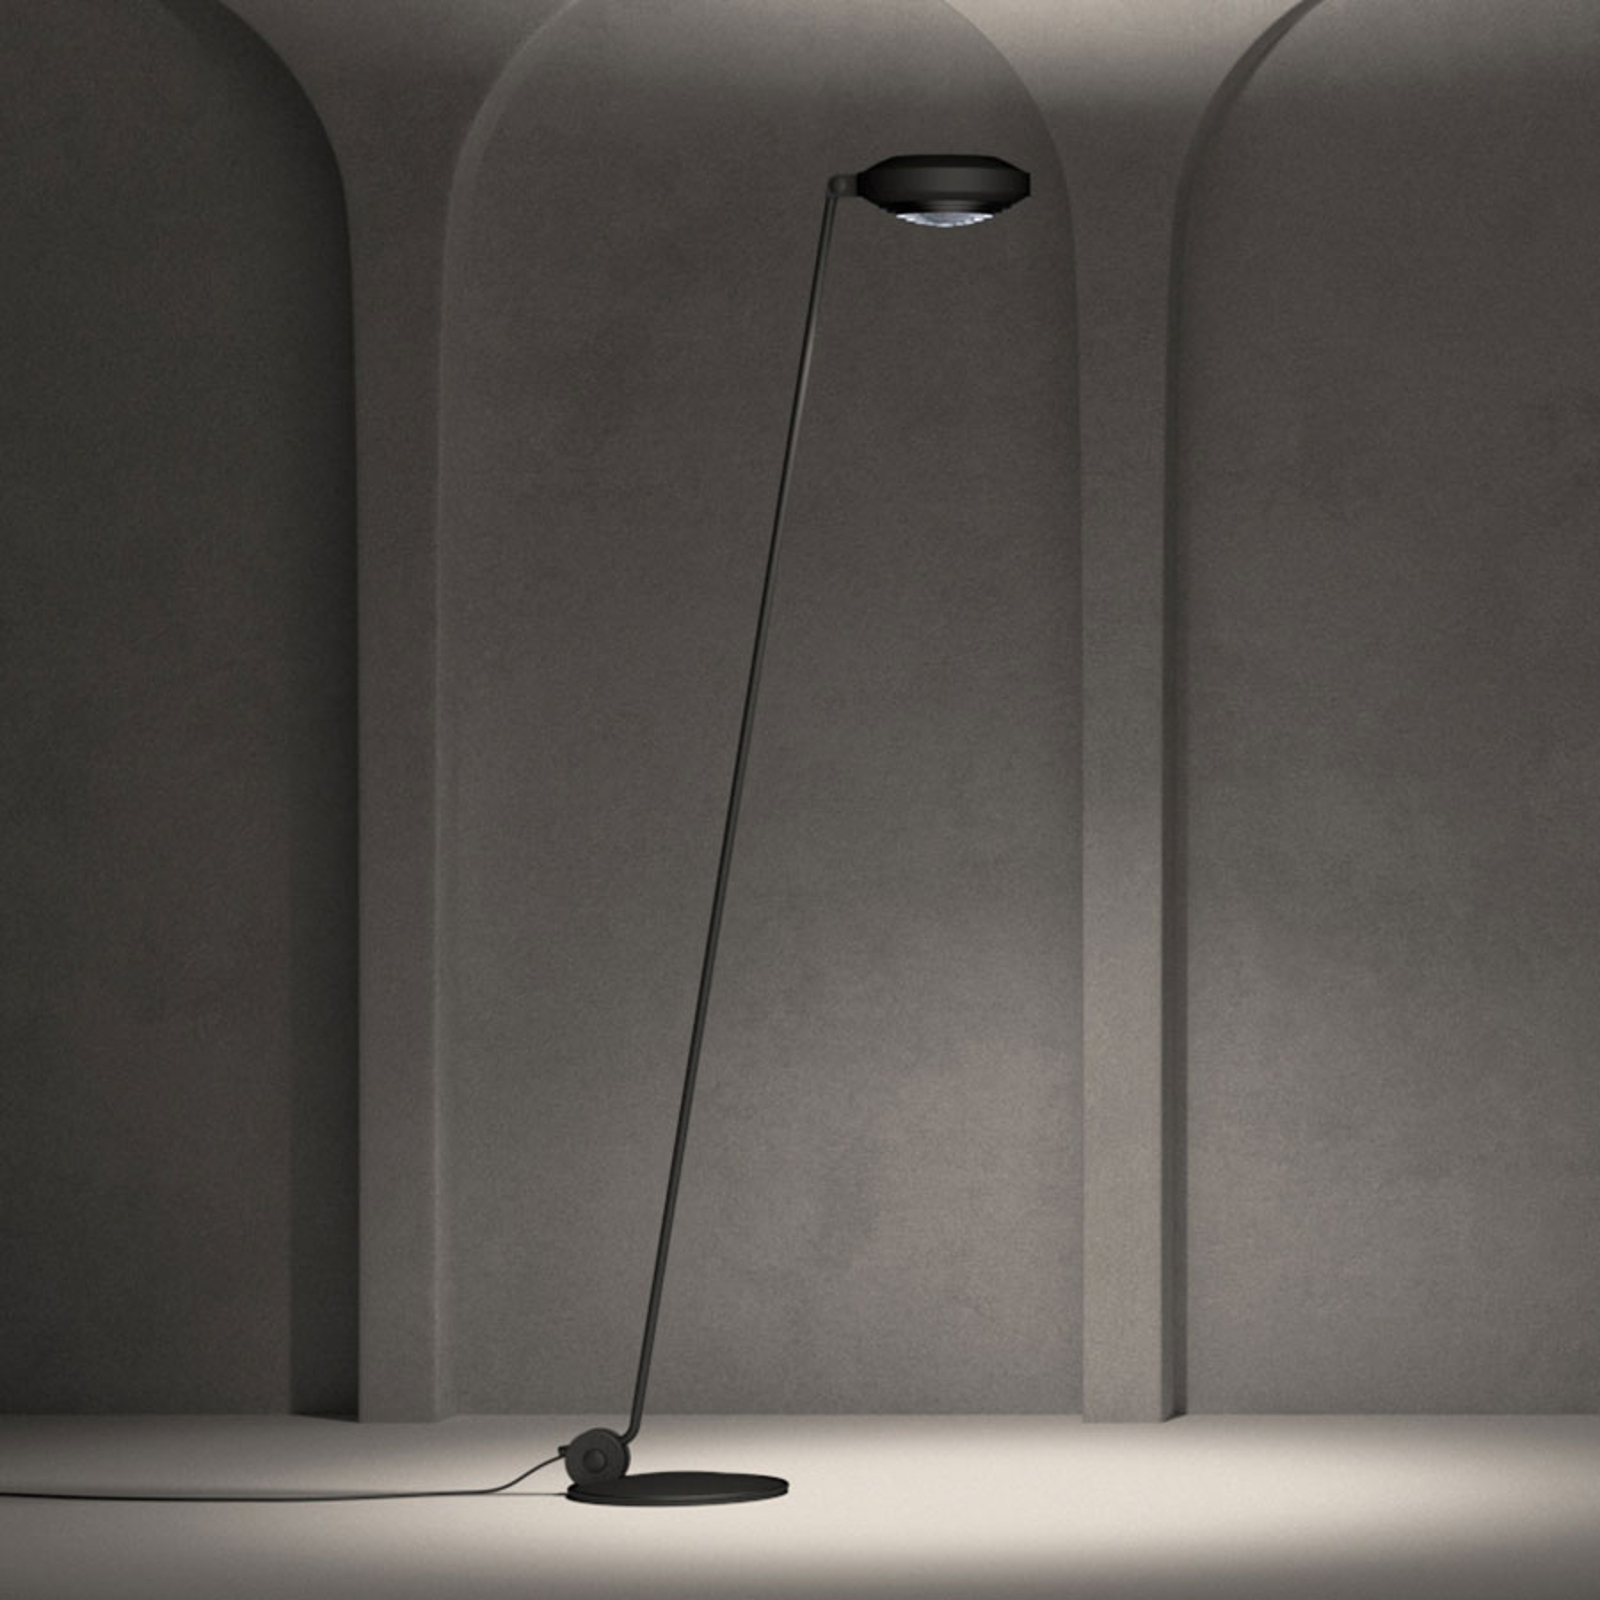 Lumina Elle 1 piantana LED H 180cm 3.000K nero